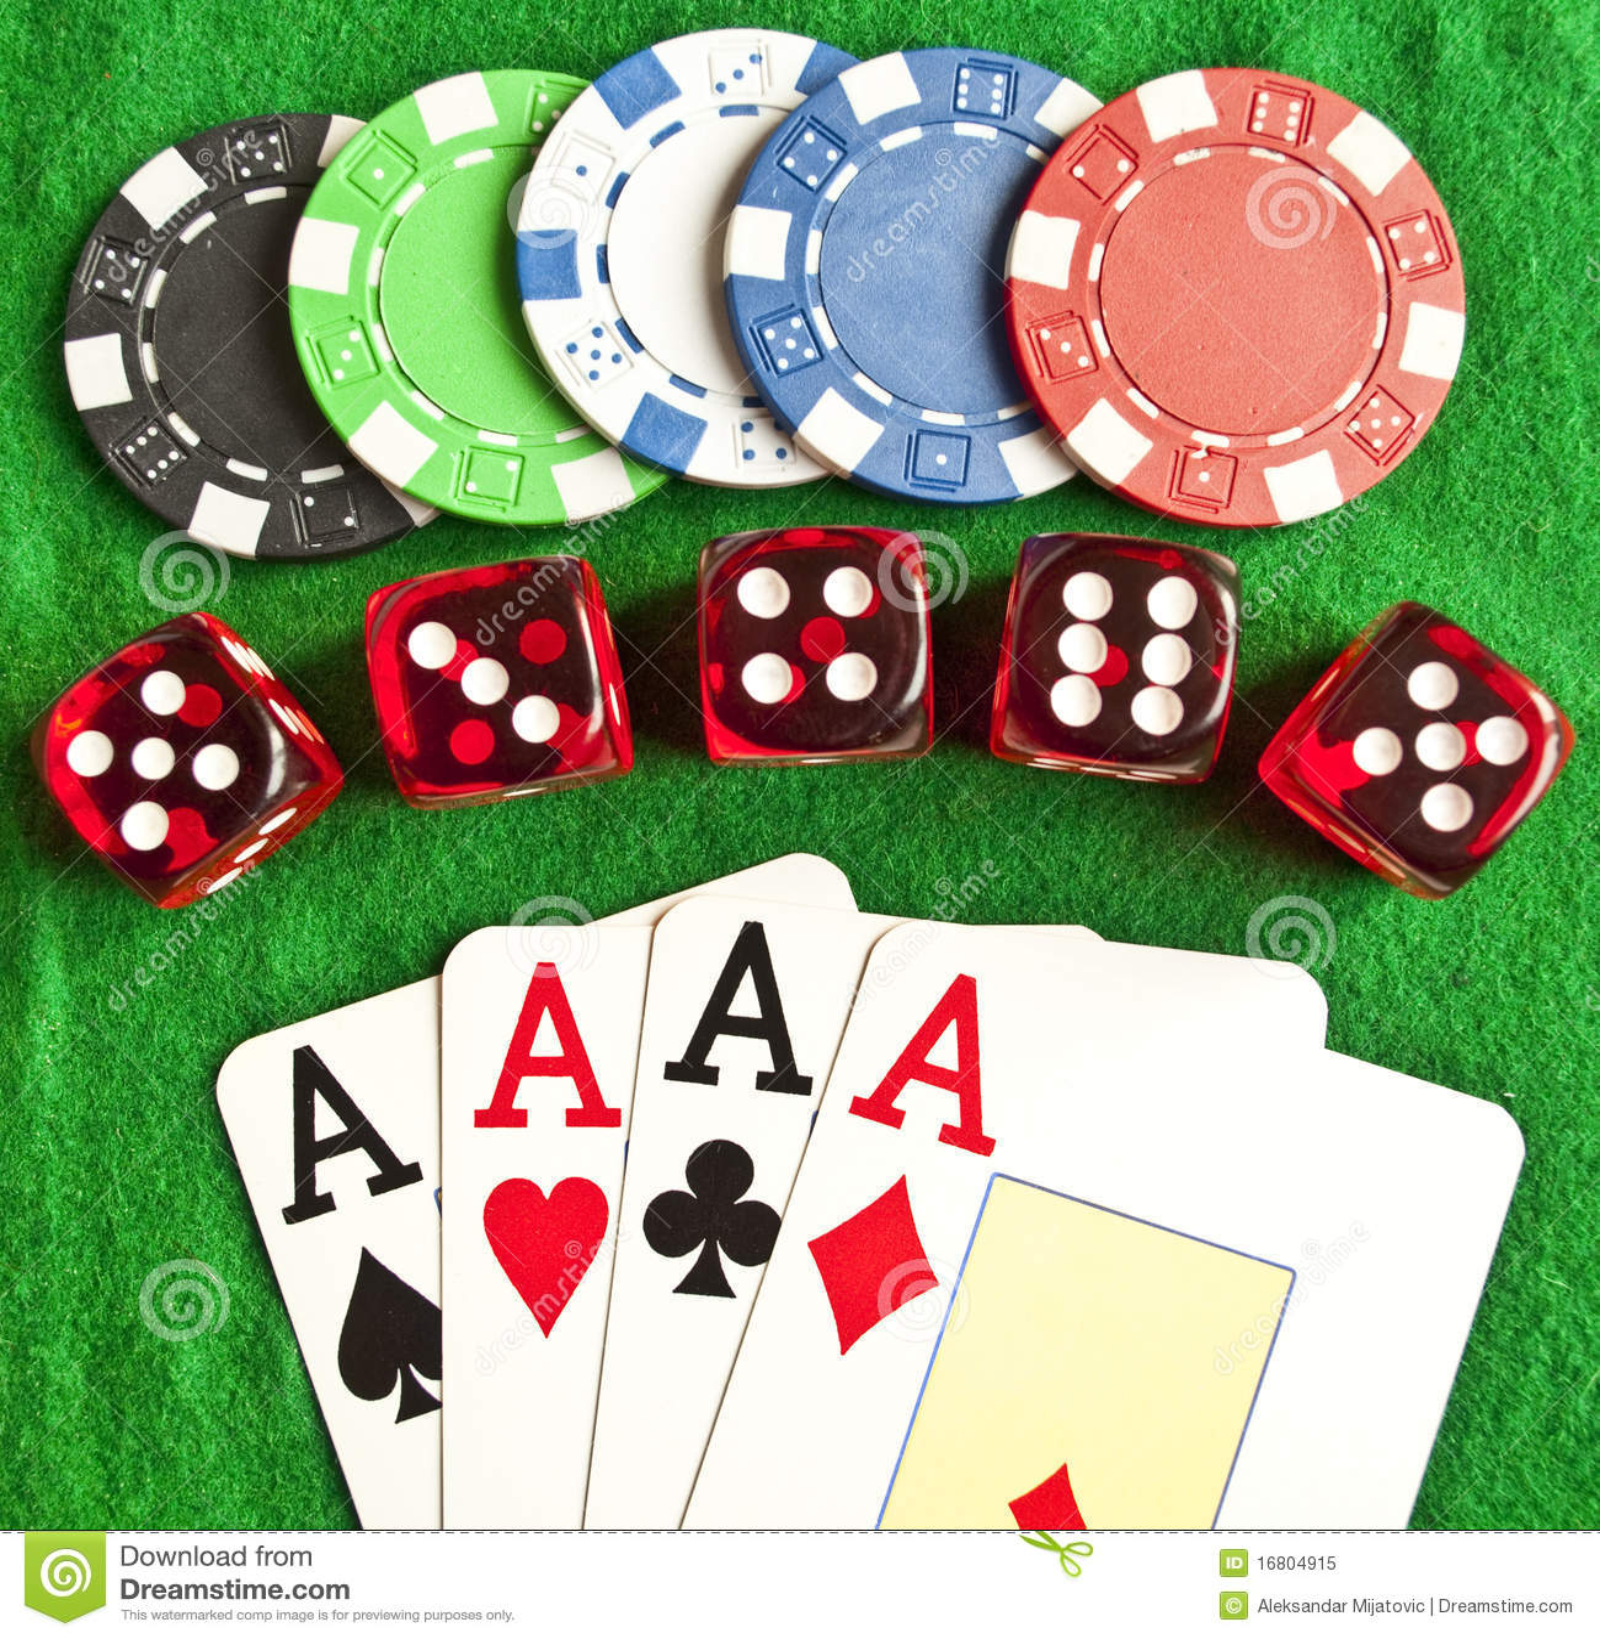 Gambling poker gambling casino style party ideas